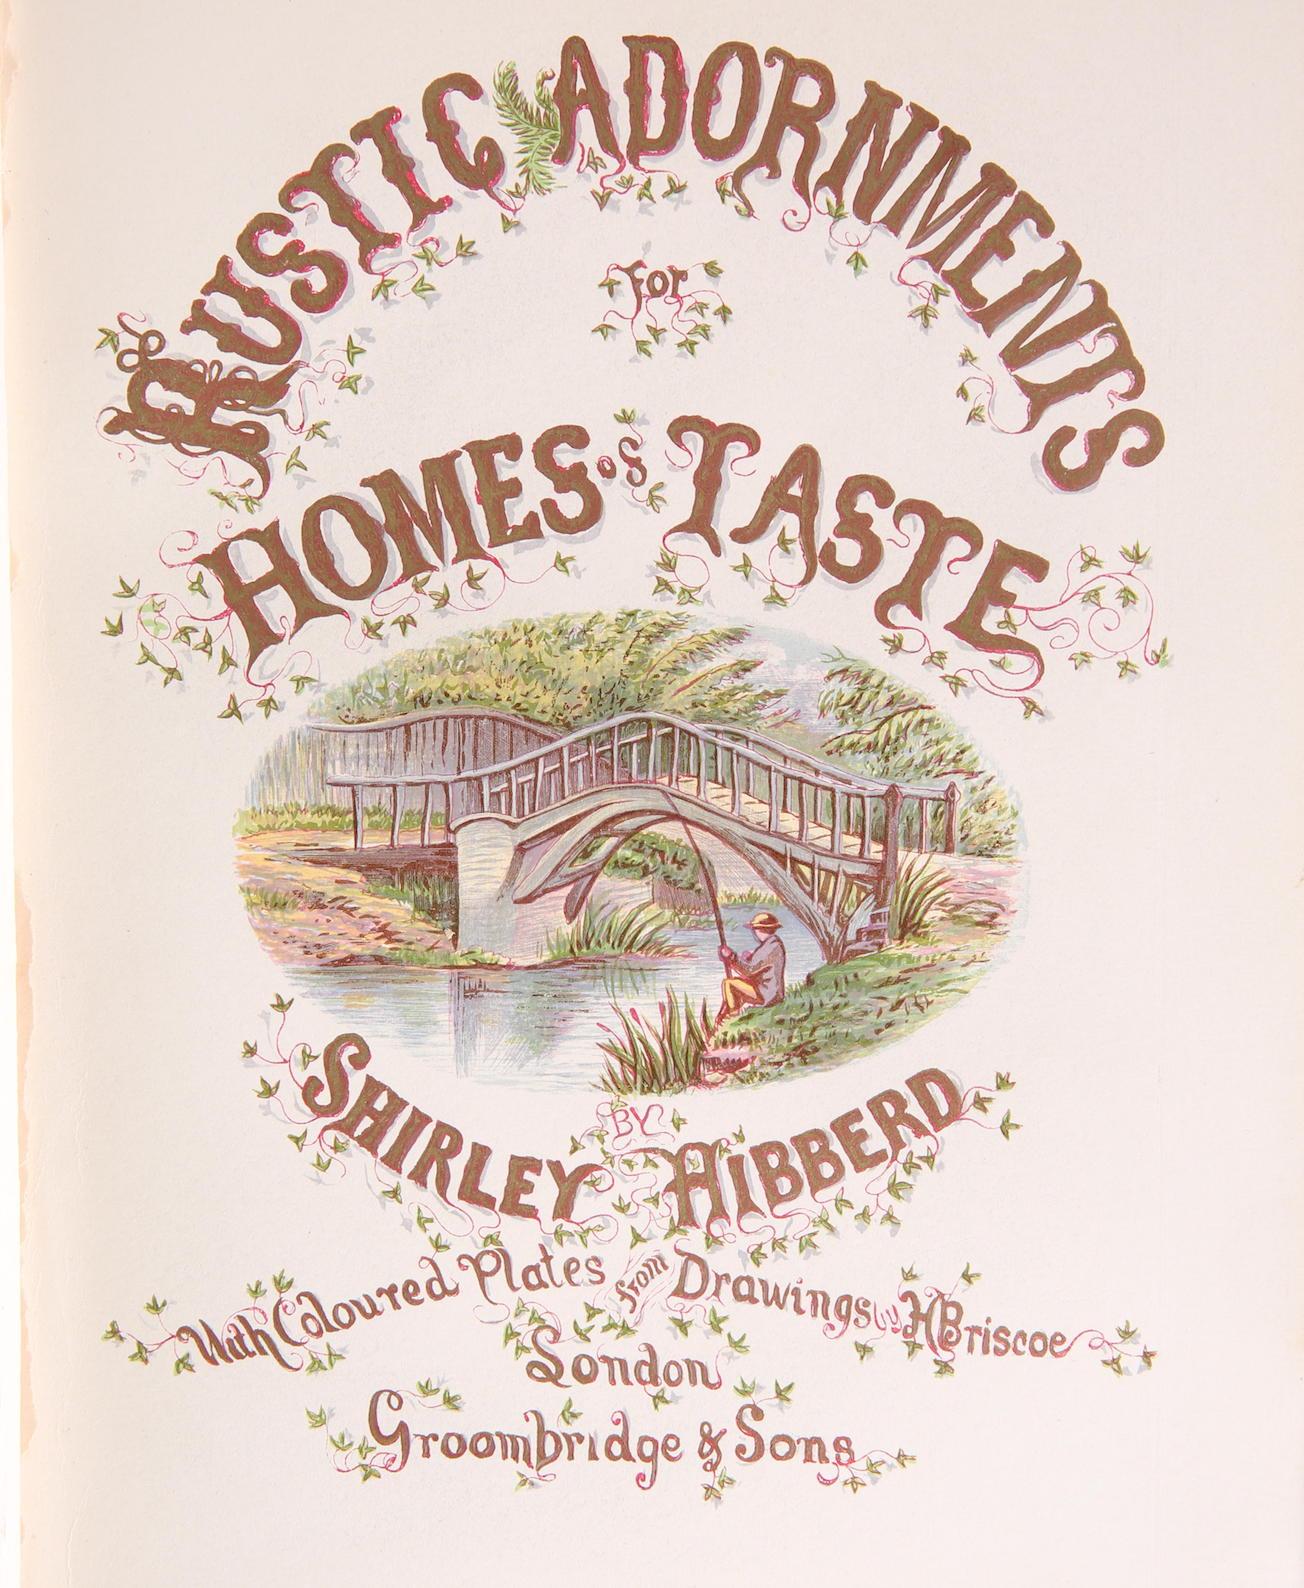 Shirley Hibberd Rustic Adornments